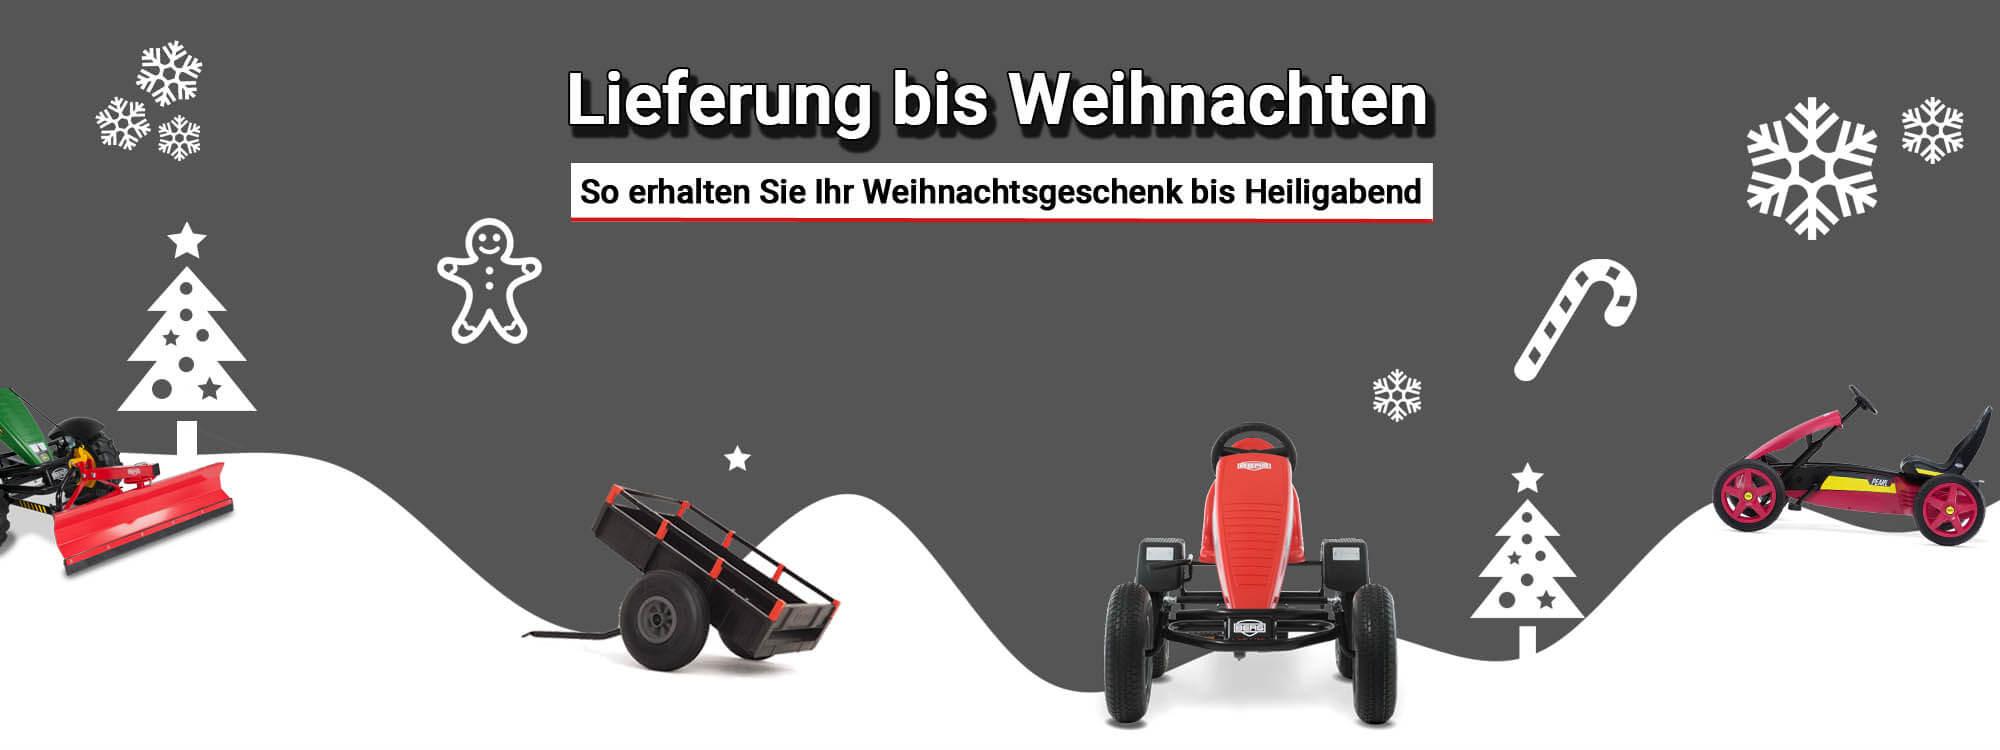 Lieferung zu Weihnachten - bei gokart-profi.de